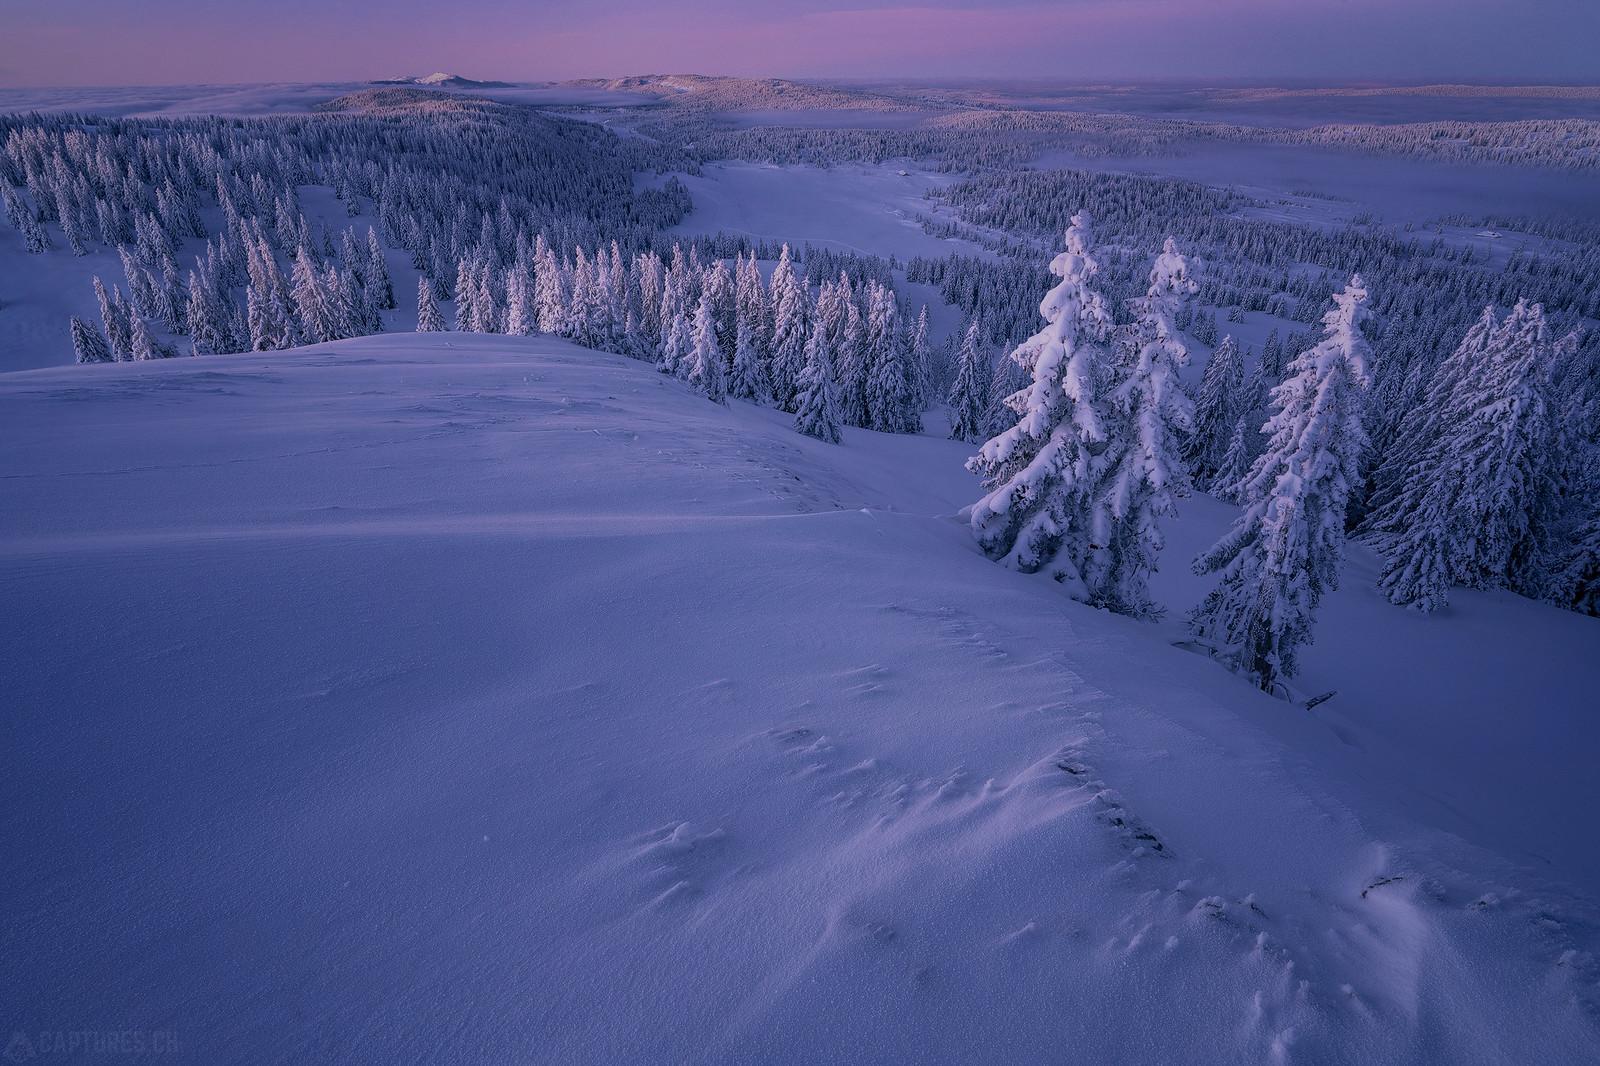 Iced landscape - Jura